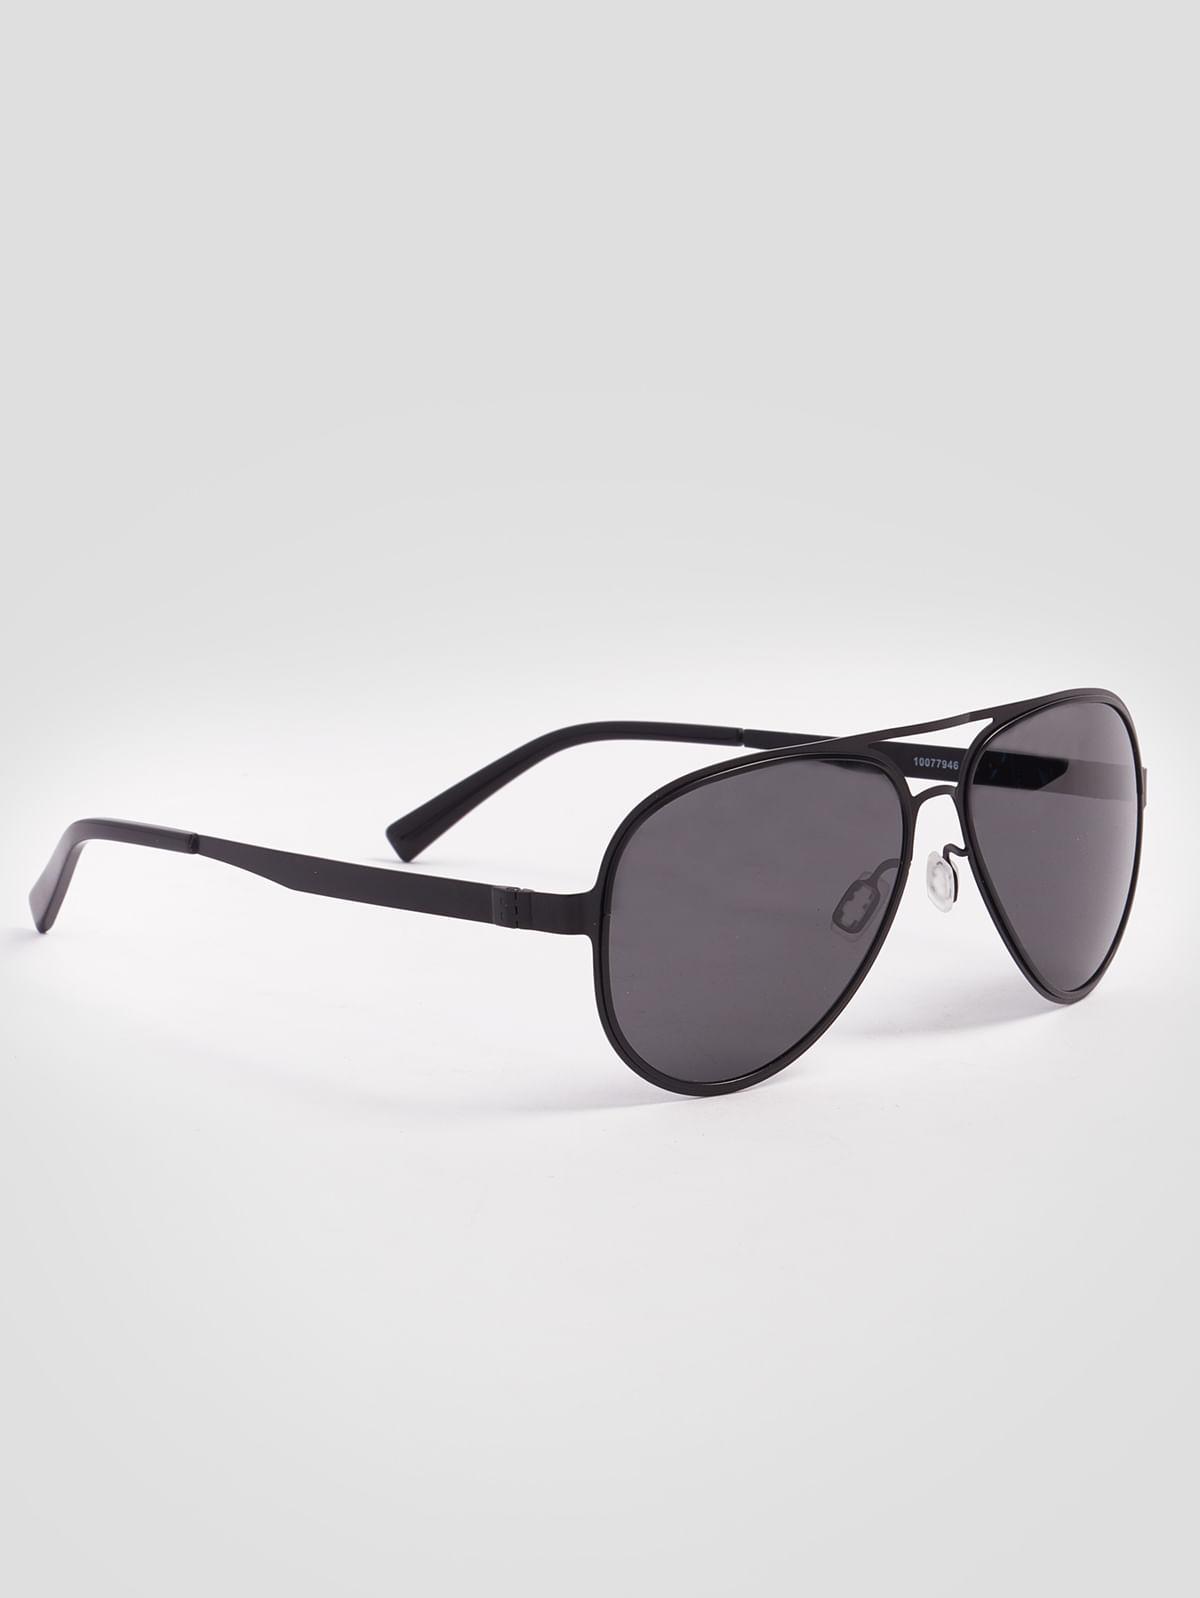 7b41728d53 Gafas de Sol para Hombre 77946 - Arturo Calle